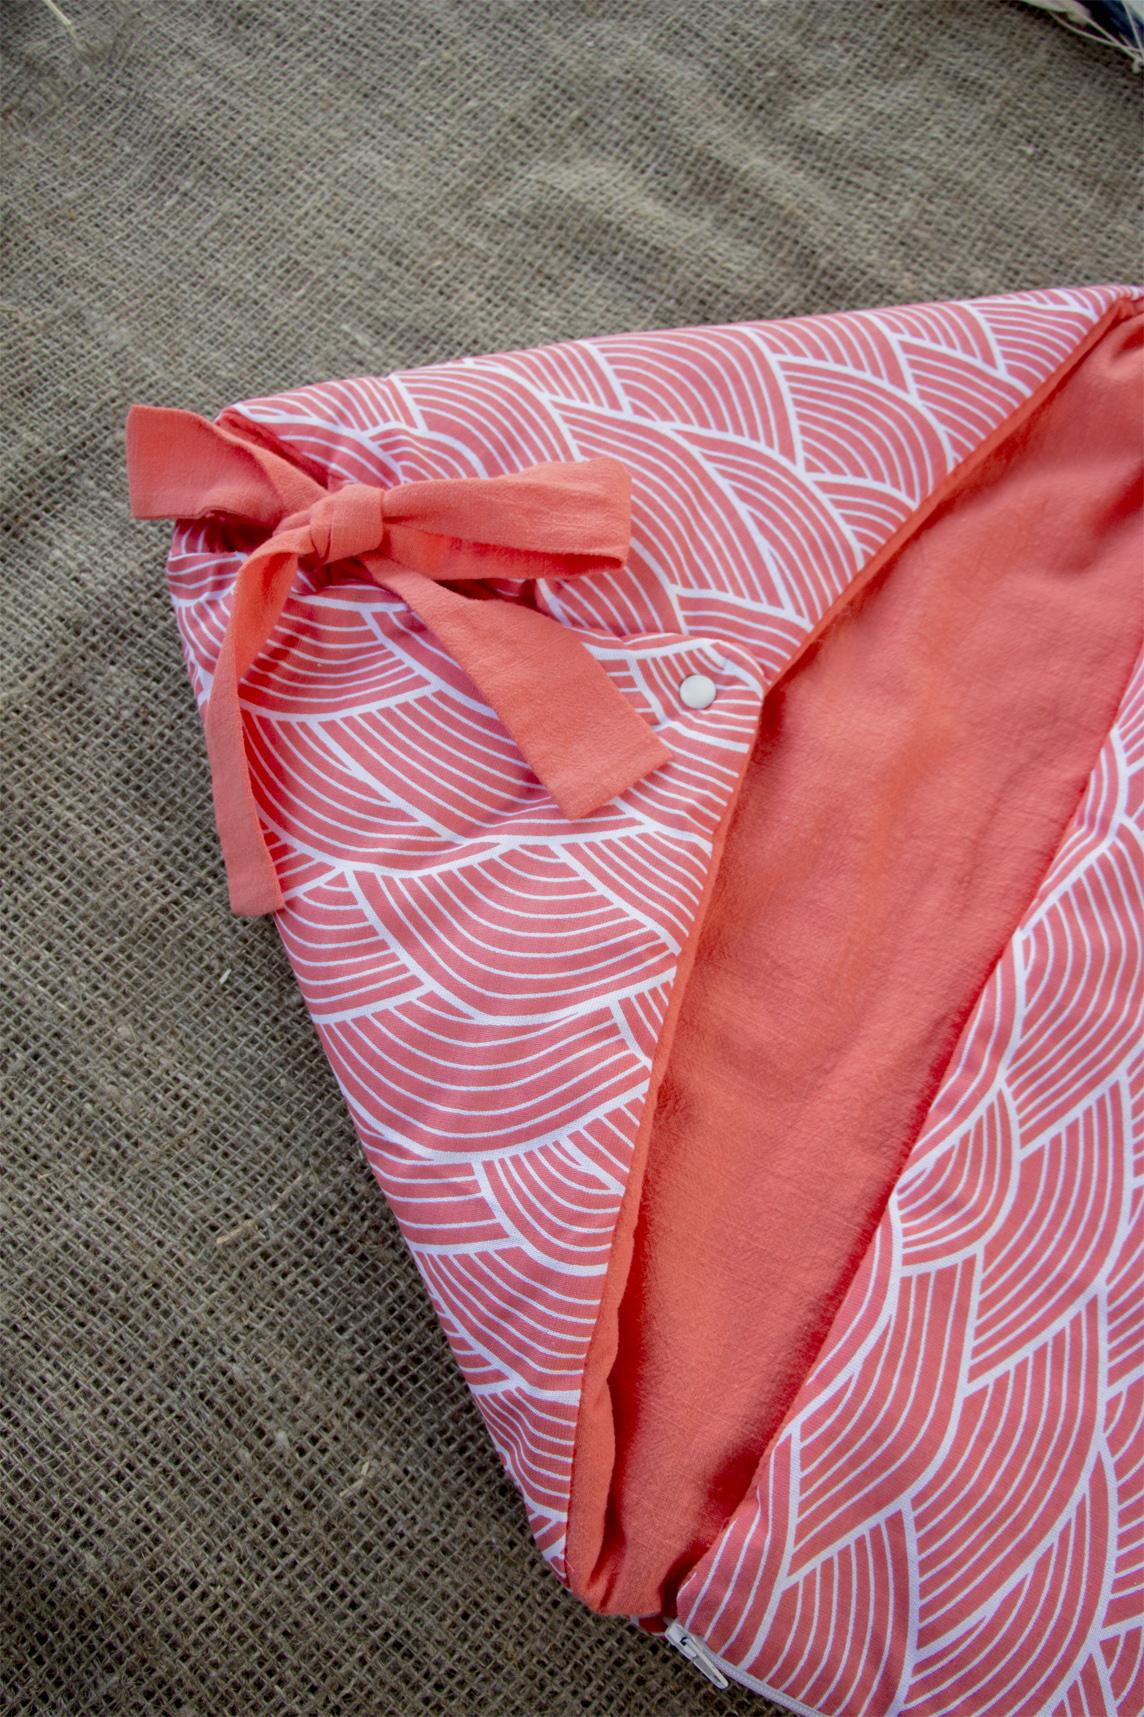 Sleepy time sleeping bag (Copy) (Copy)